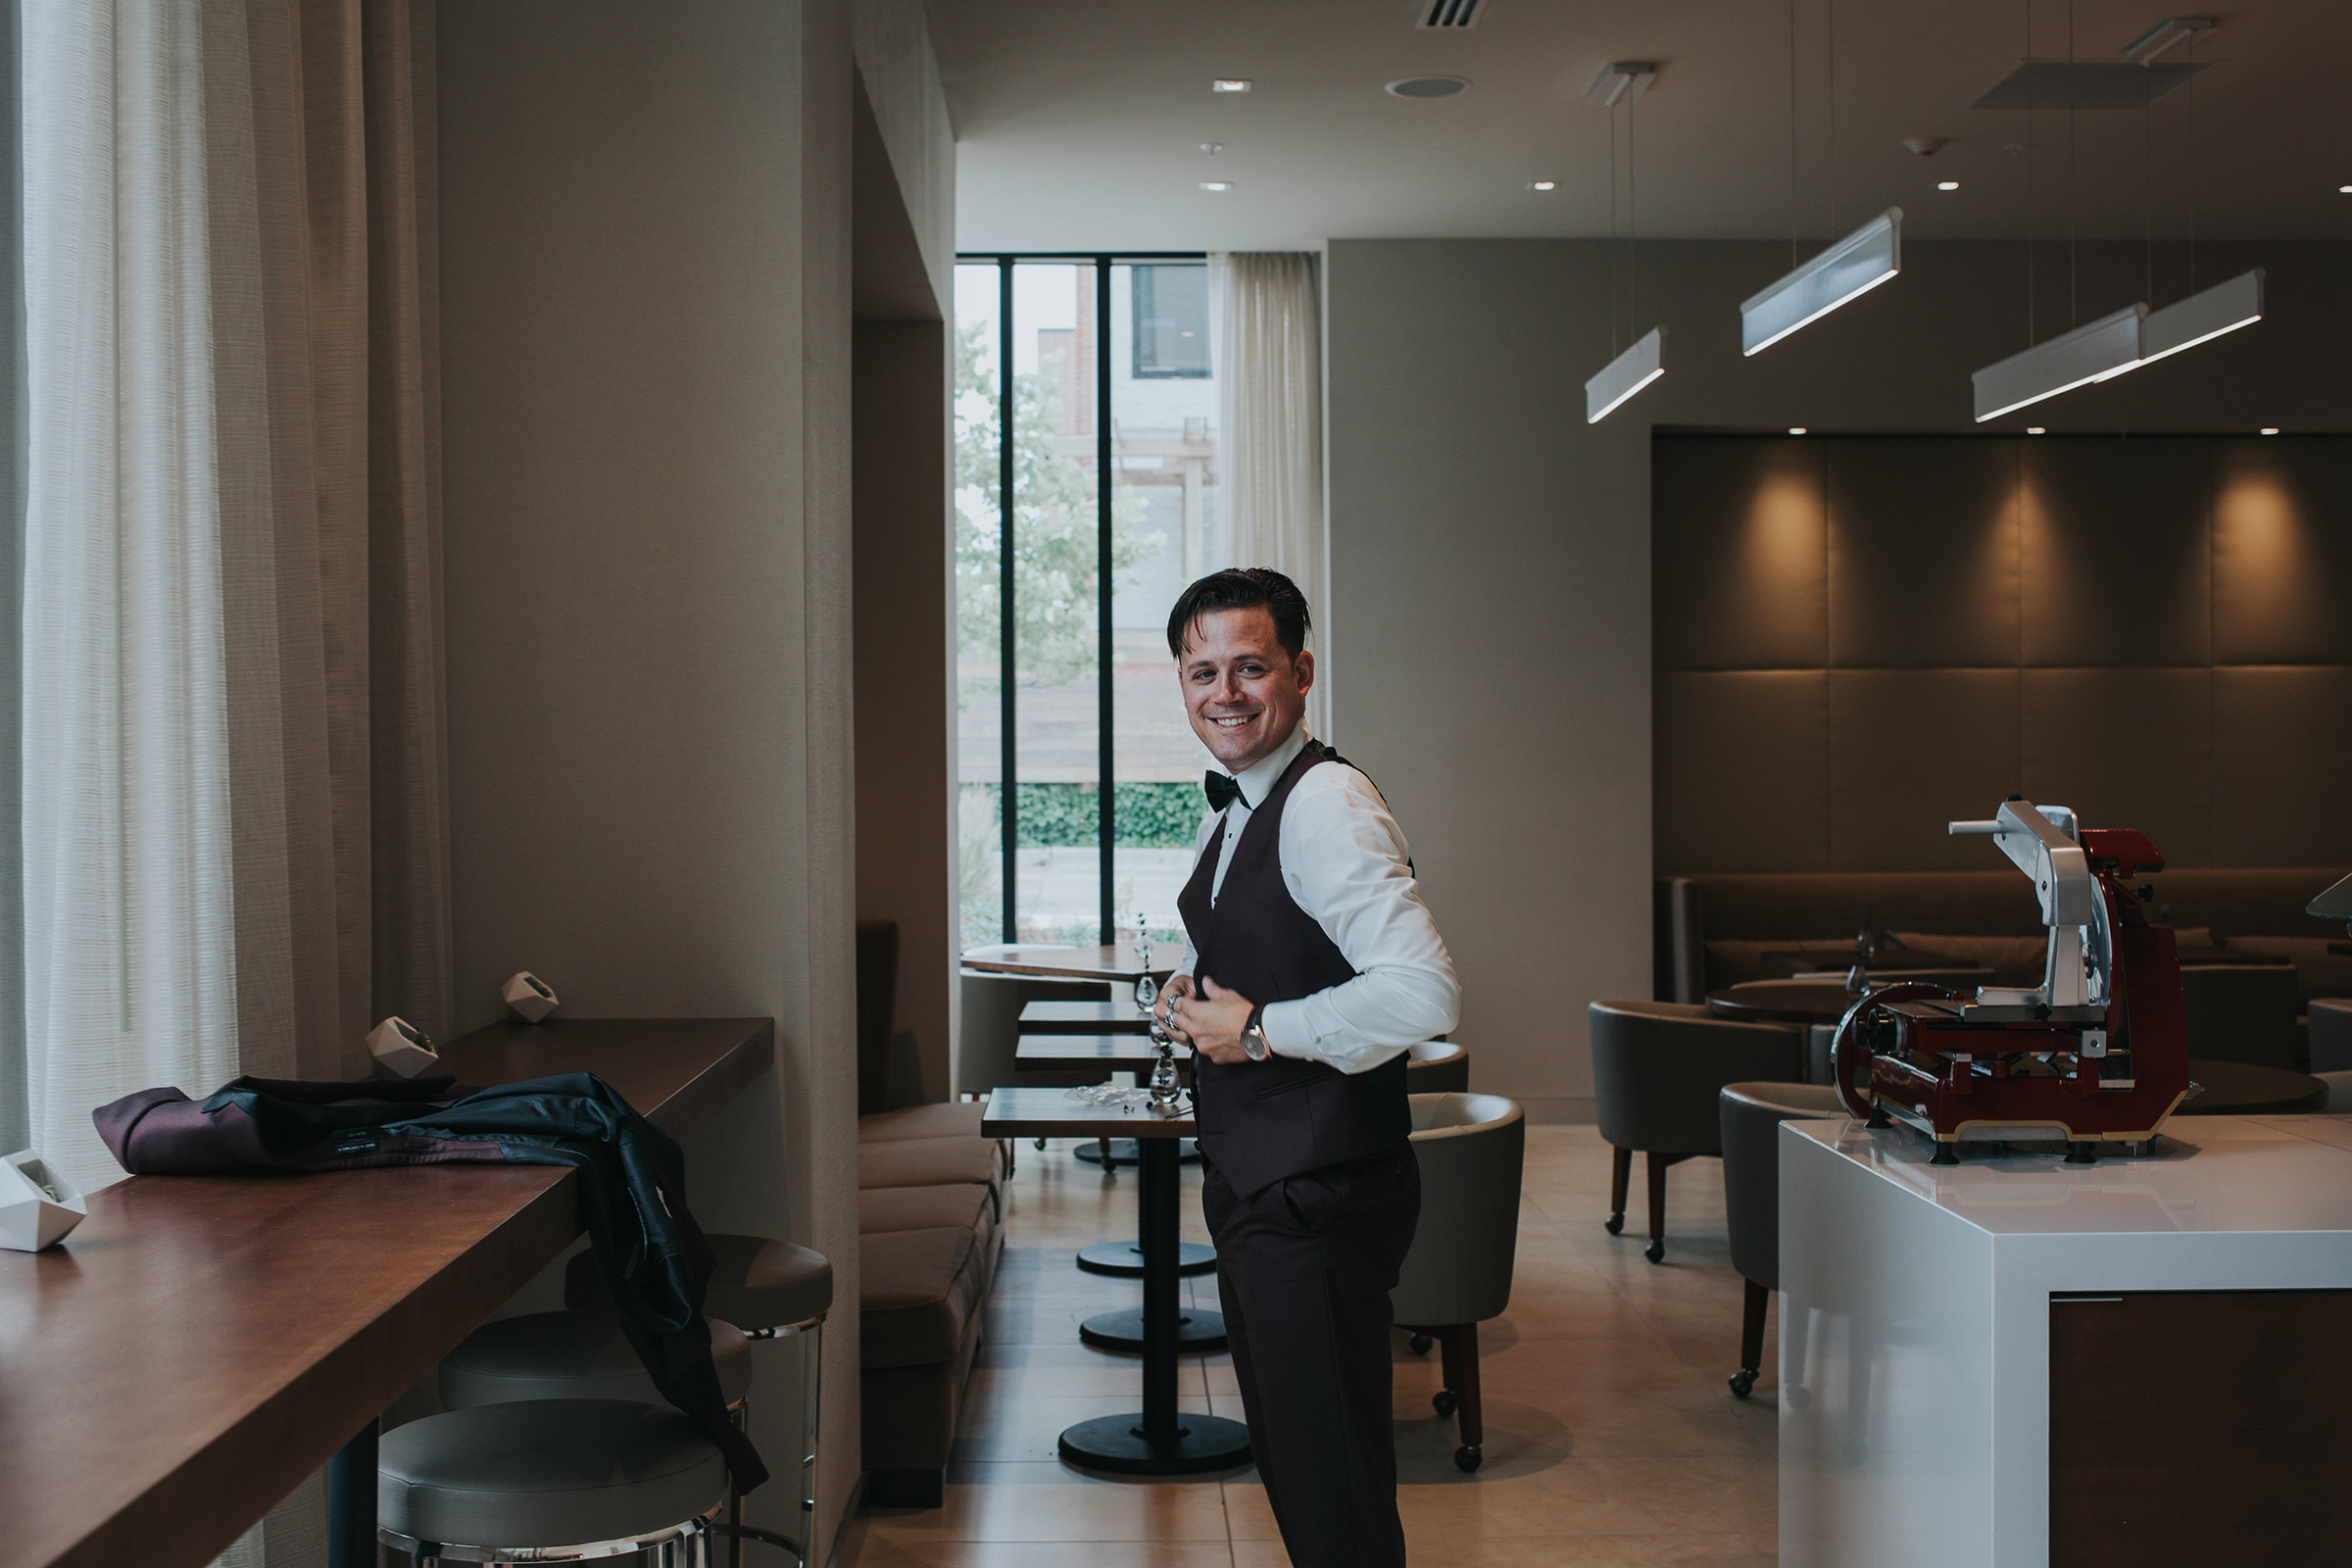 groom-putting-vest-on-desmoines-iowa-ac-hotel-raelyn-ramey-photography.jpg